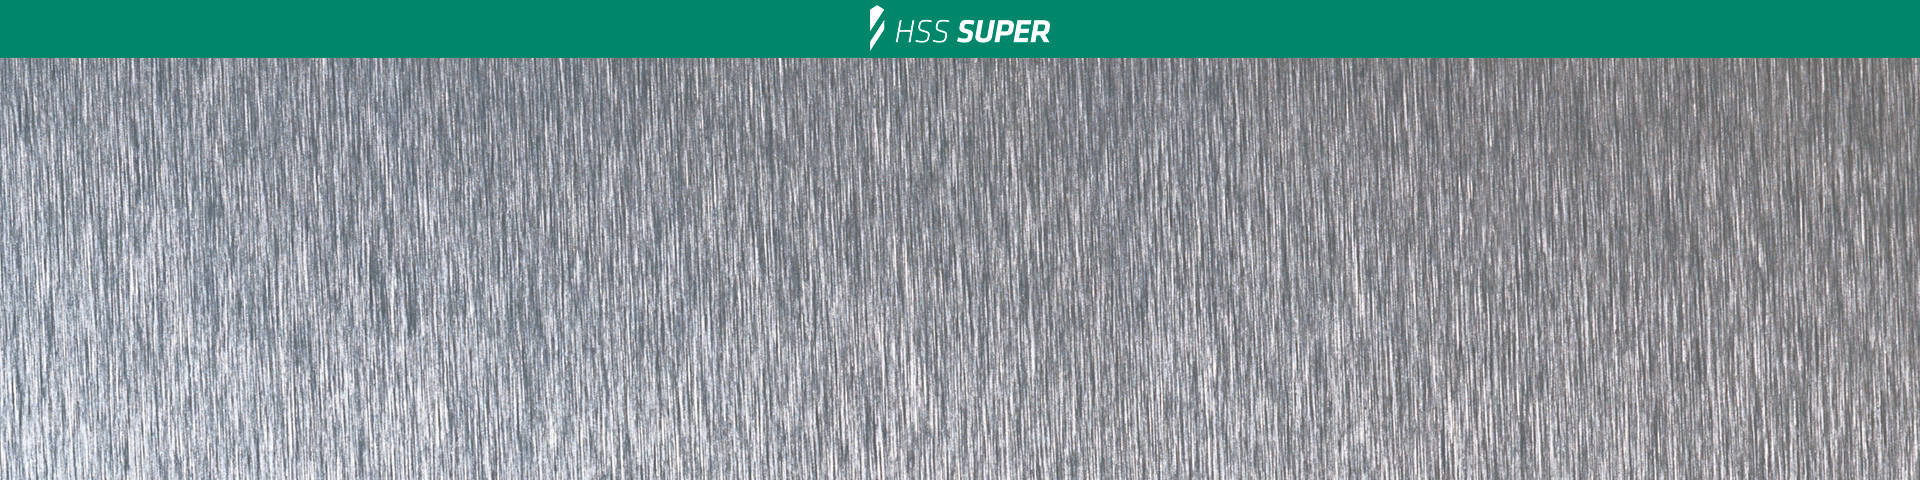 2mm Alpen 60300120100 Morse Taper Shank Drills Hss-Eco Din 338 Rn 1